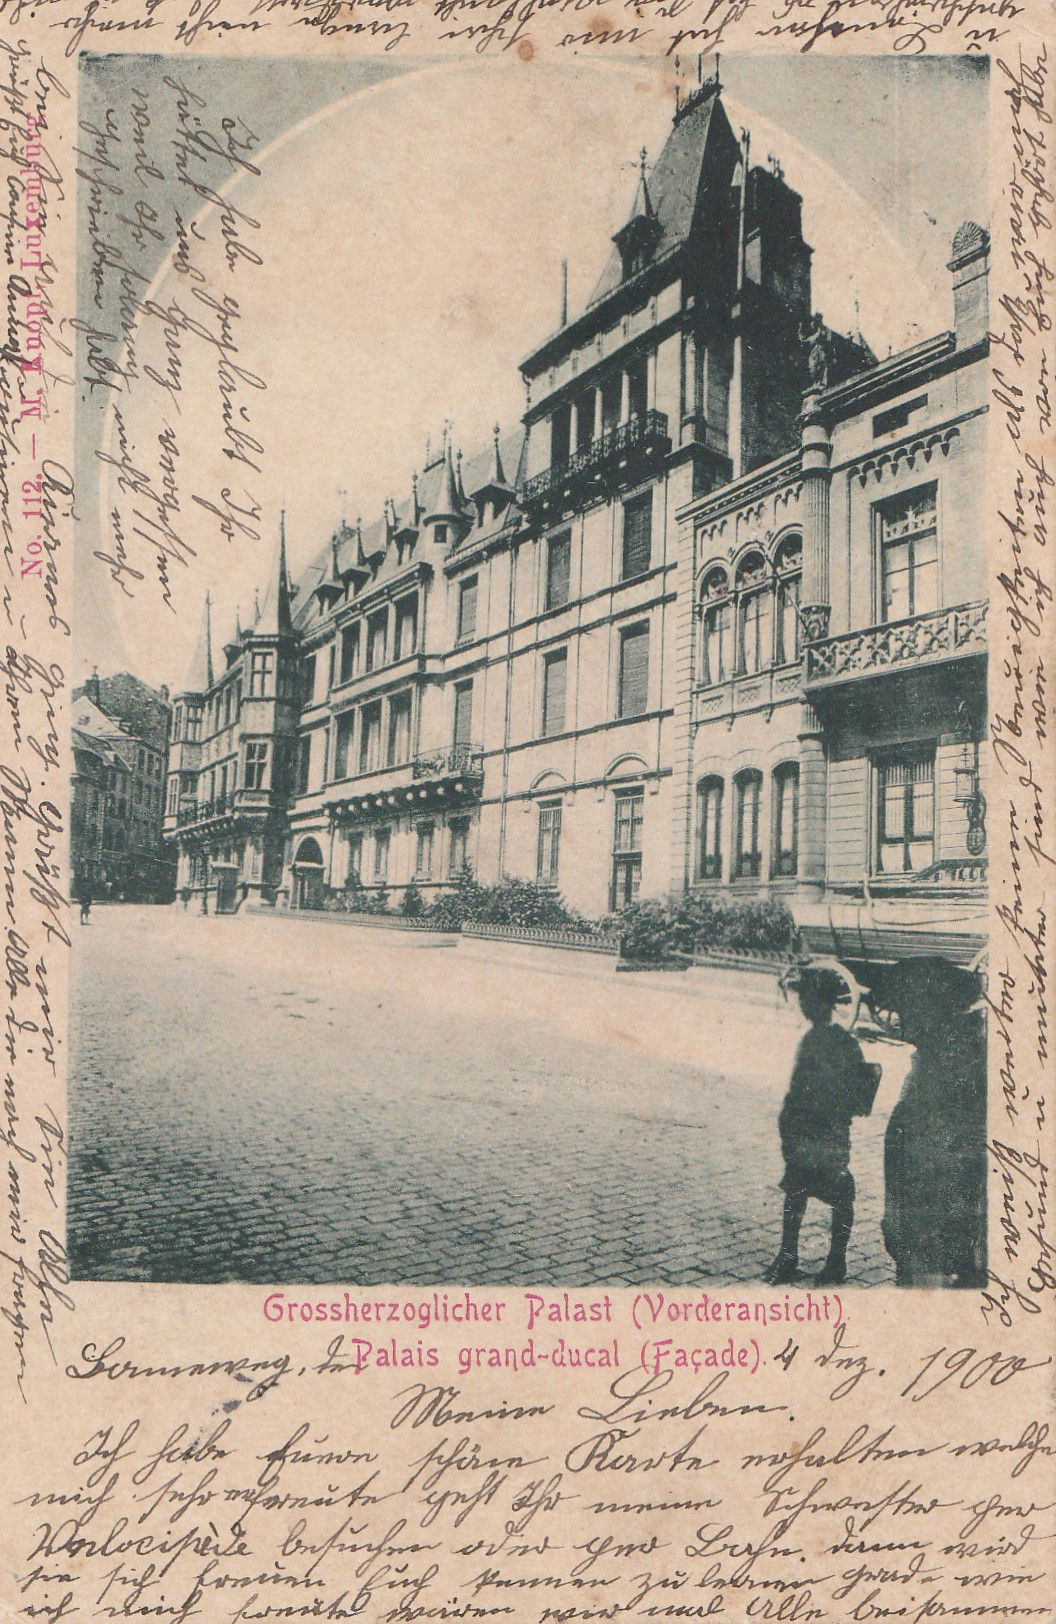 Der Großherzogliche Palast - Le palais Grand - Ducal - The Grand Ducal Palace - 05.12.1900